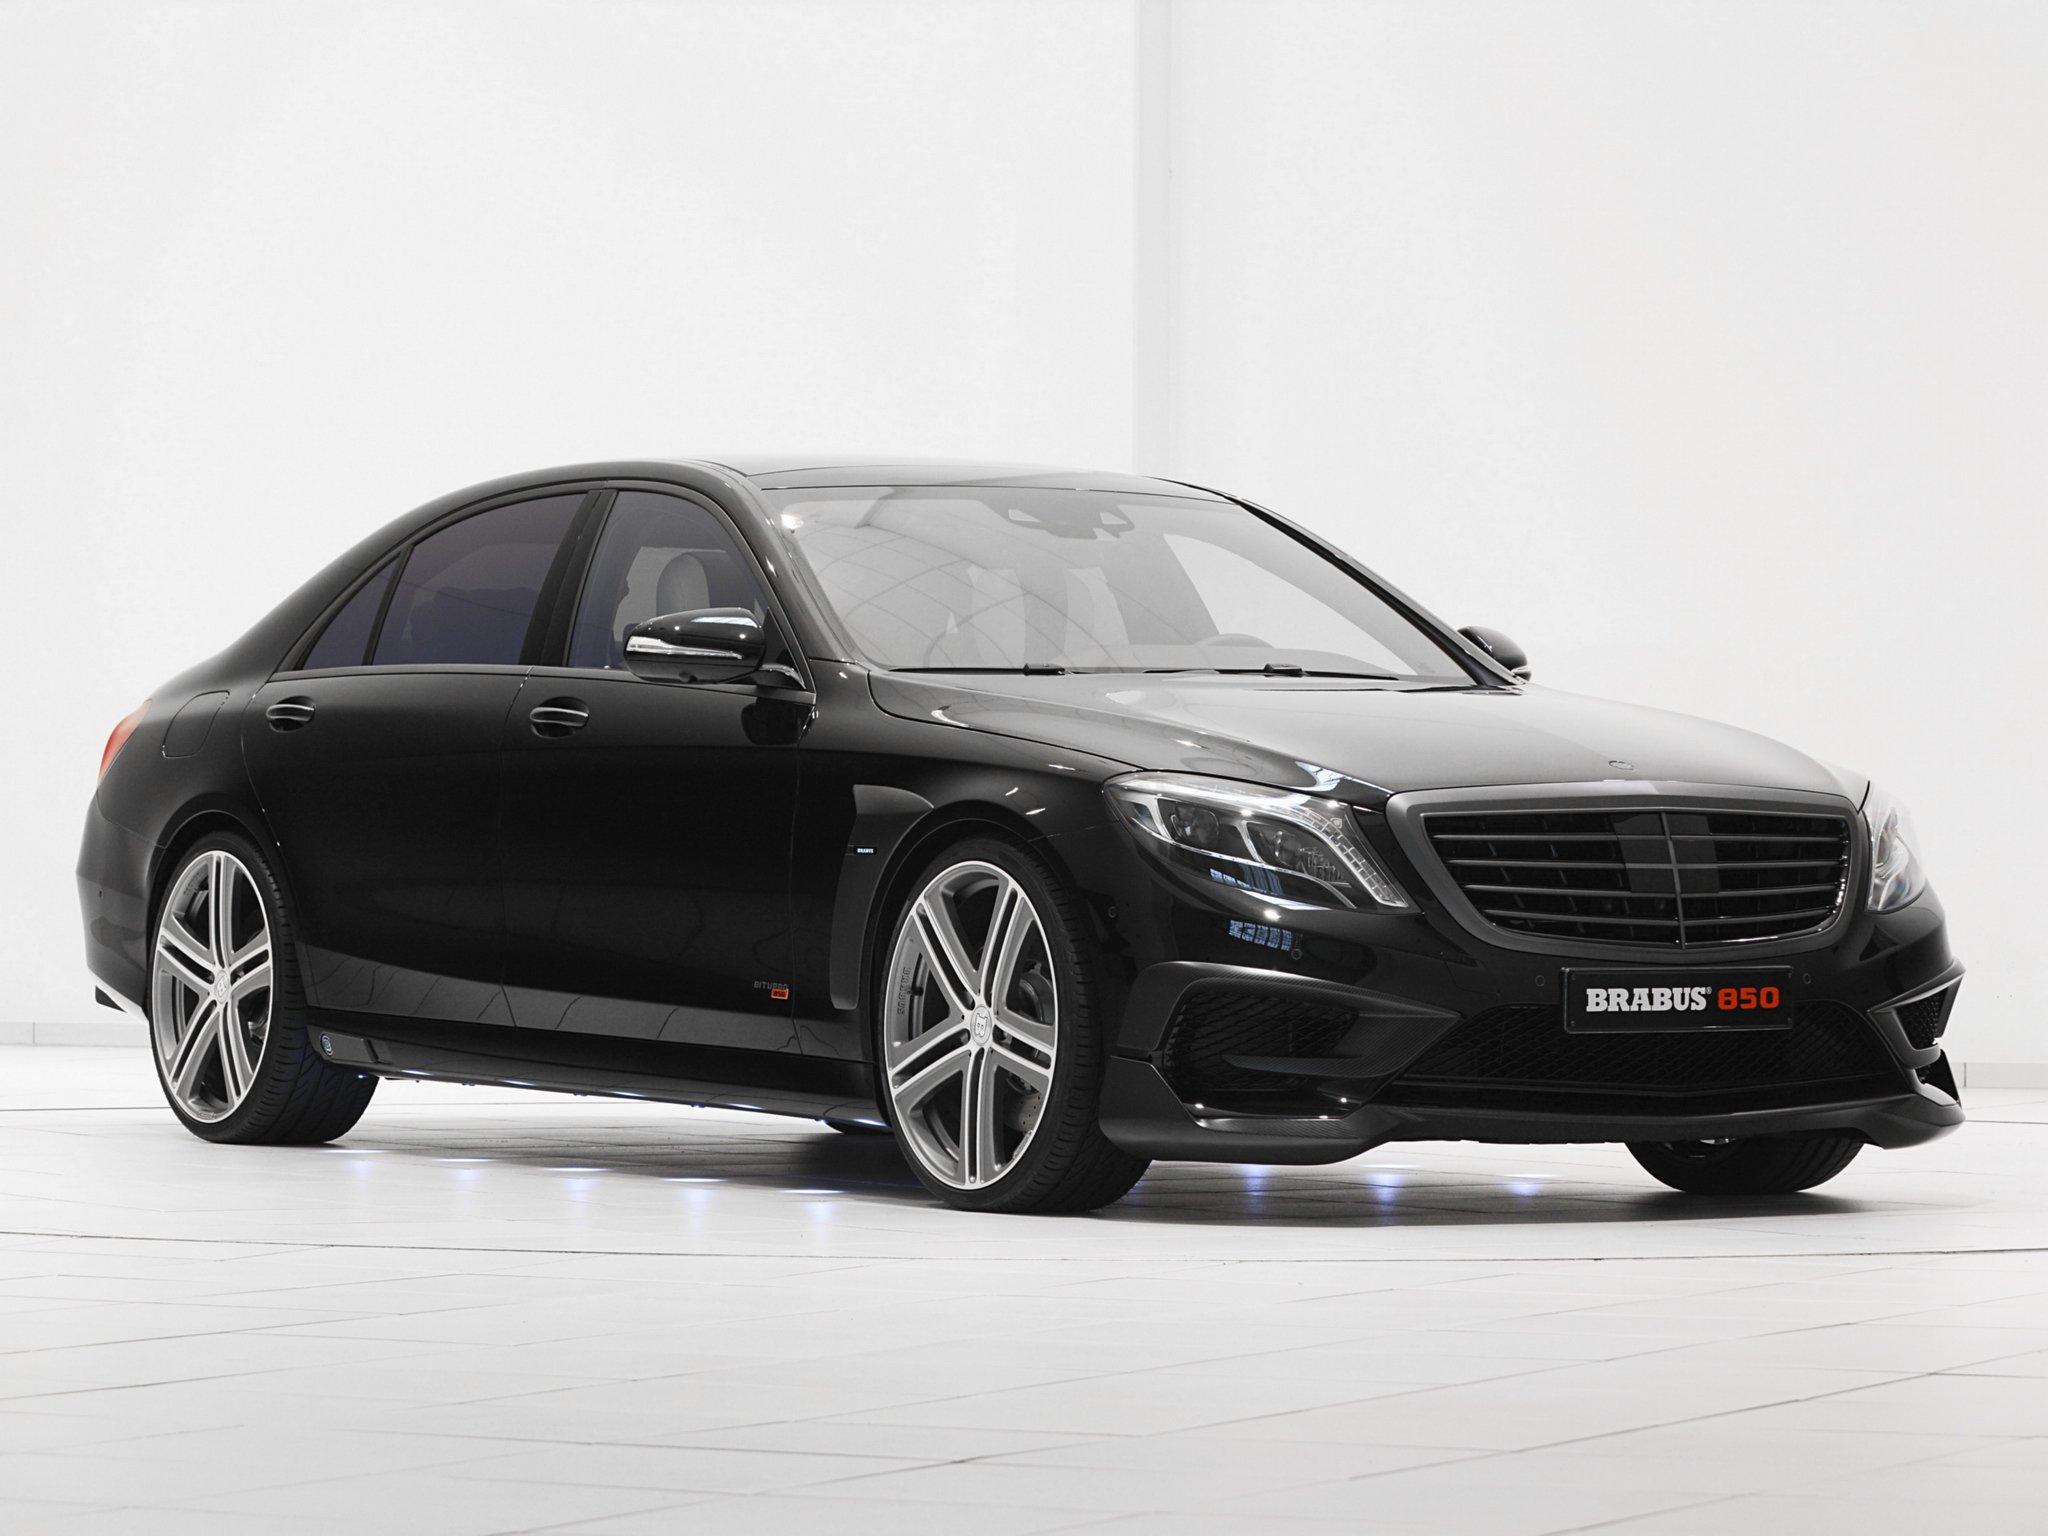 S 63 Amg Wallpaper: 2014 Brabus Mercedes Benz S63 AMG W222 Tuning Luxury F